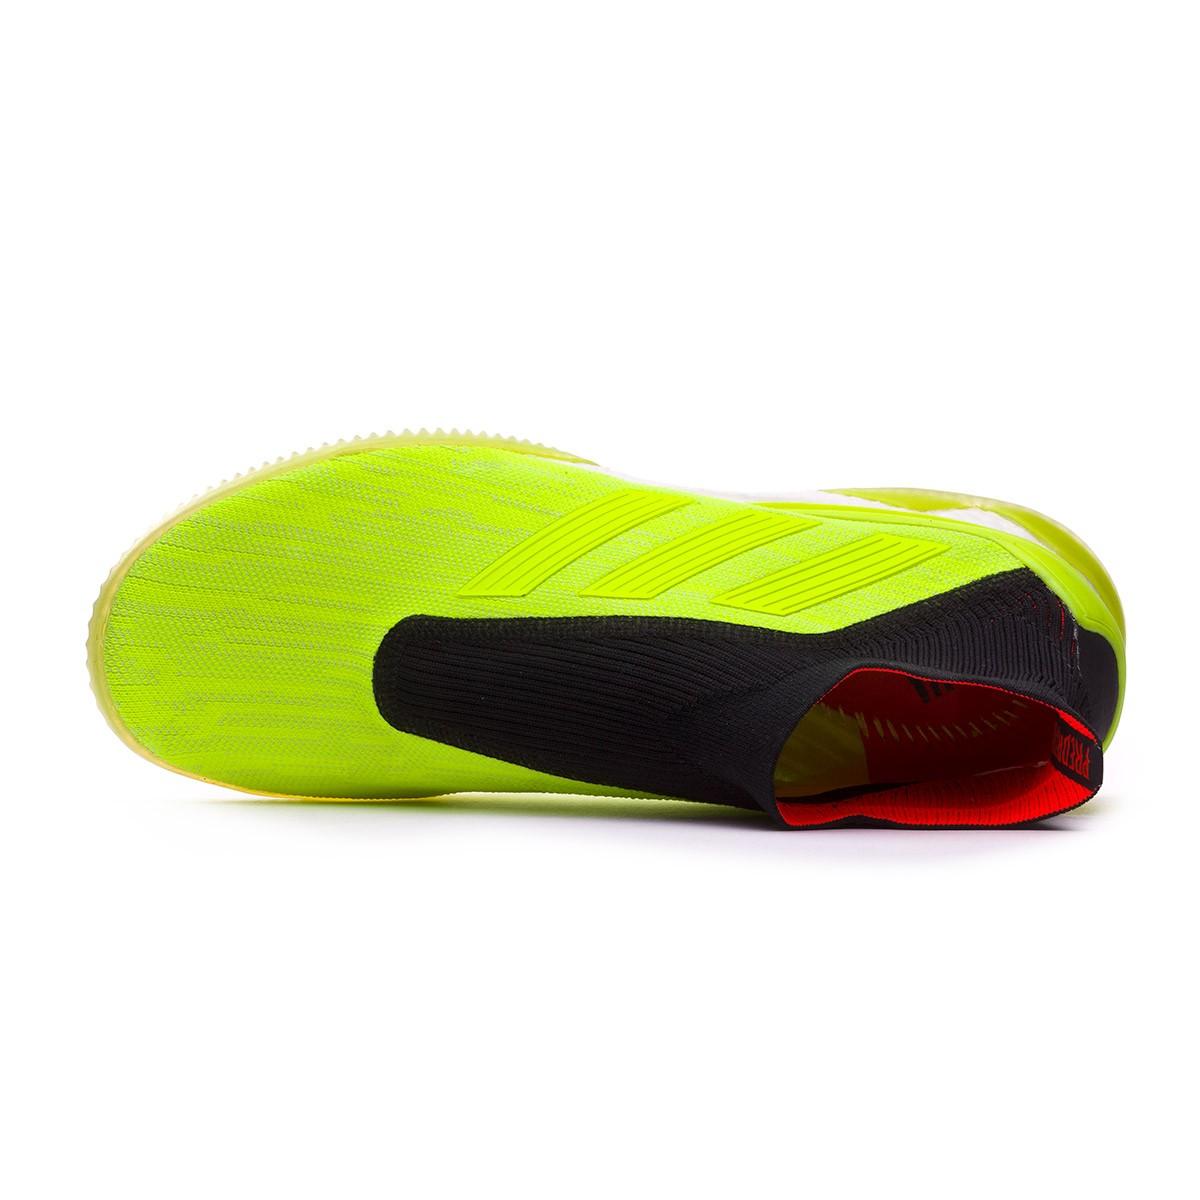 1fe41674229 Trainers adidas Predator Tango 18+ TR UltraBoost Solar yellow-Solar red -  Football store Fútbol Emotion